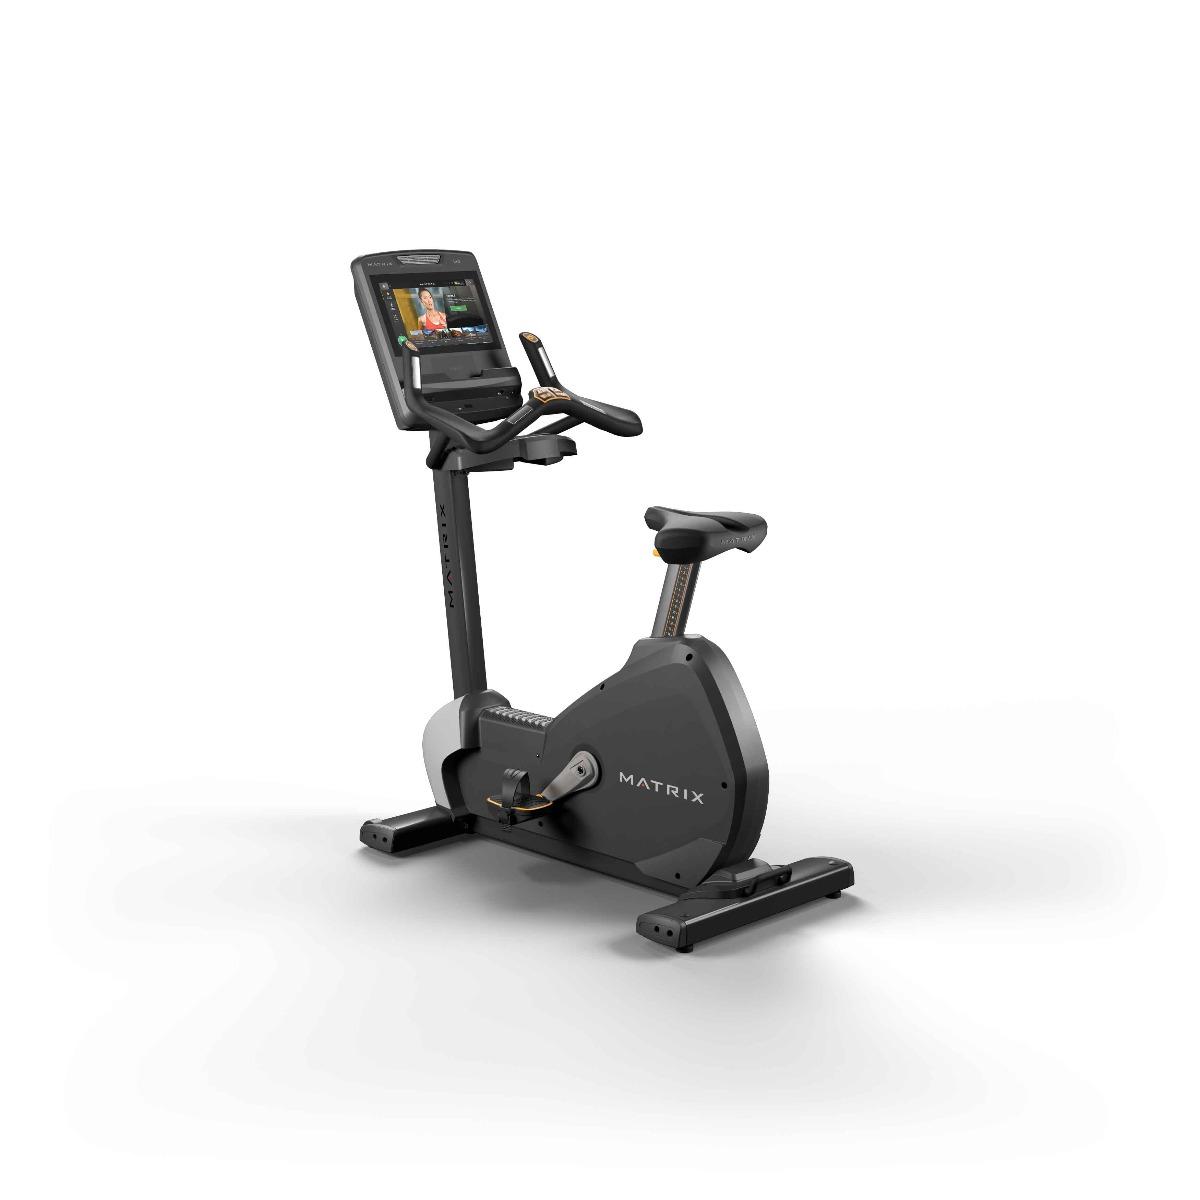 Commercial upright exercise bike